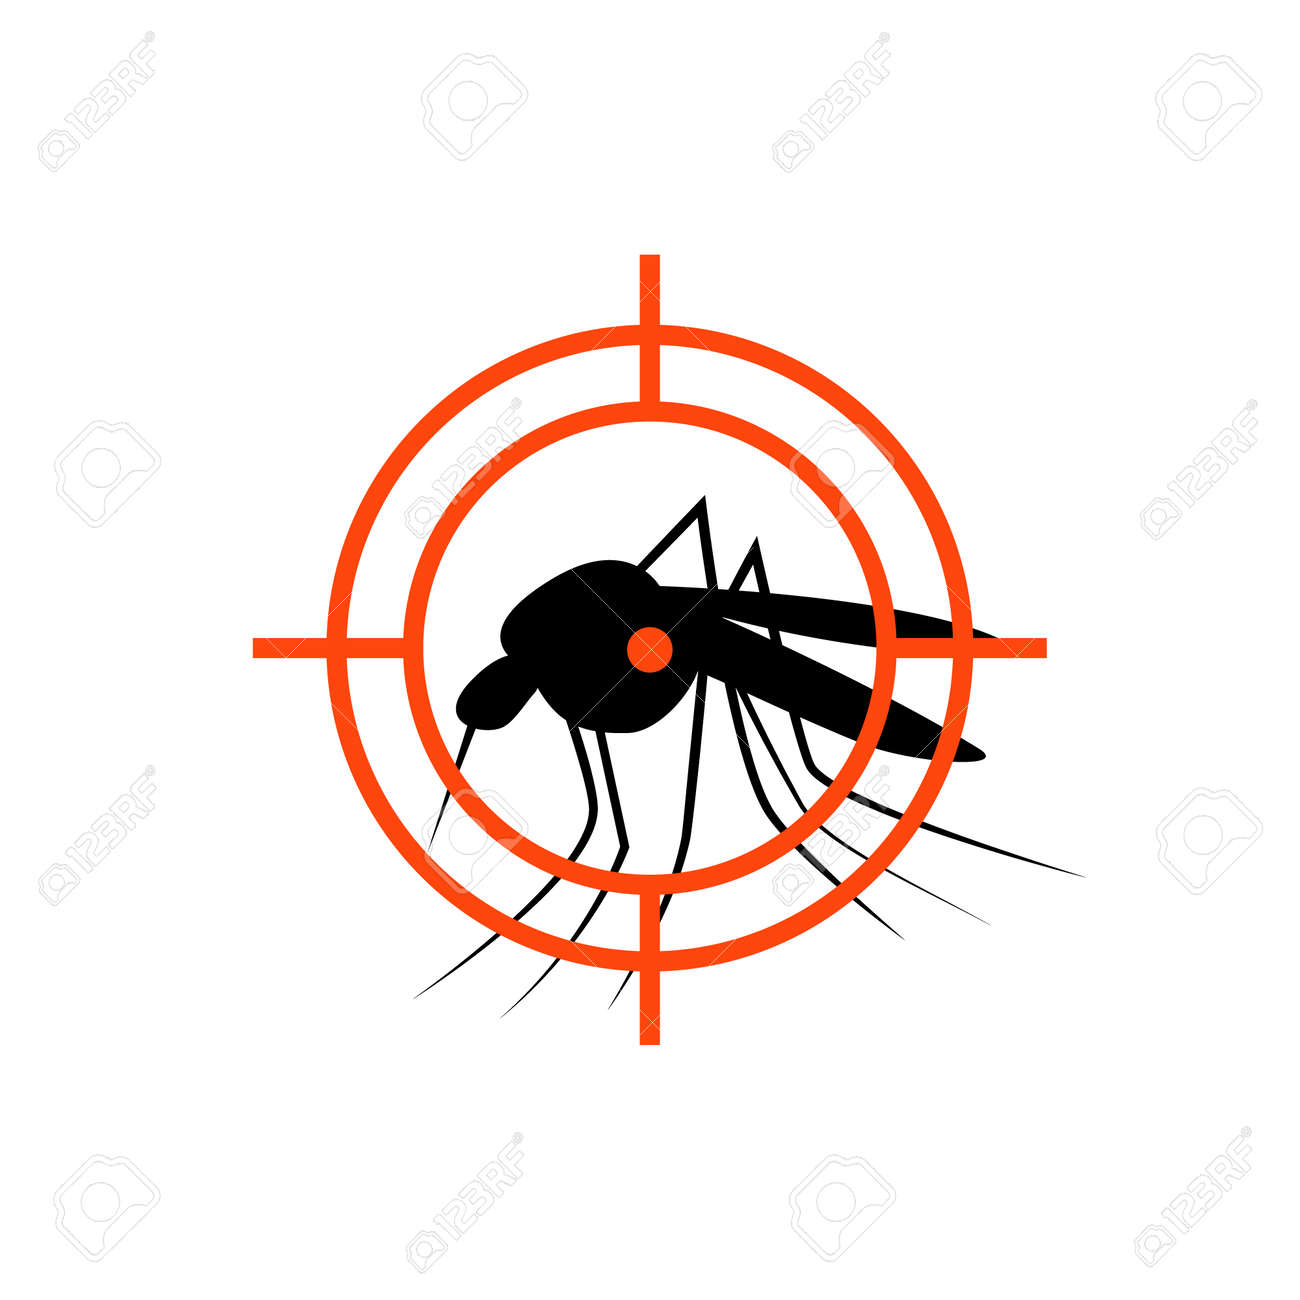 Repellent mosquito stop aim sign icon. Malaria pest insect anti mosquito warning symbol - 155138764